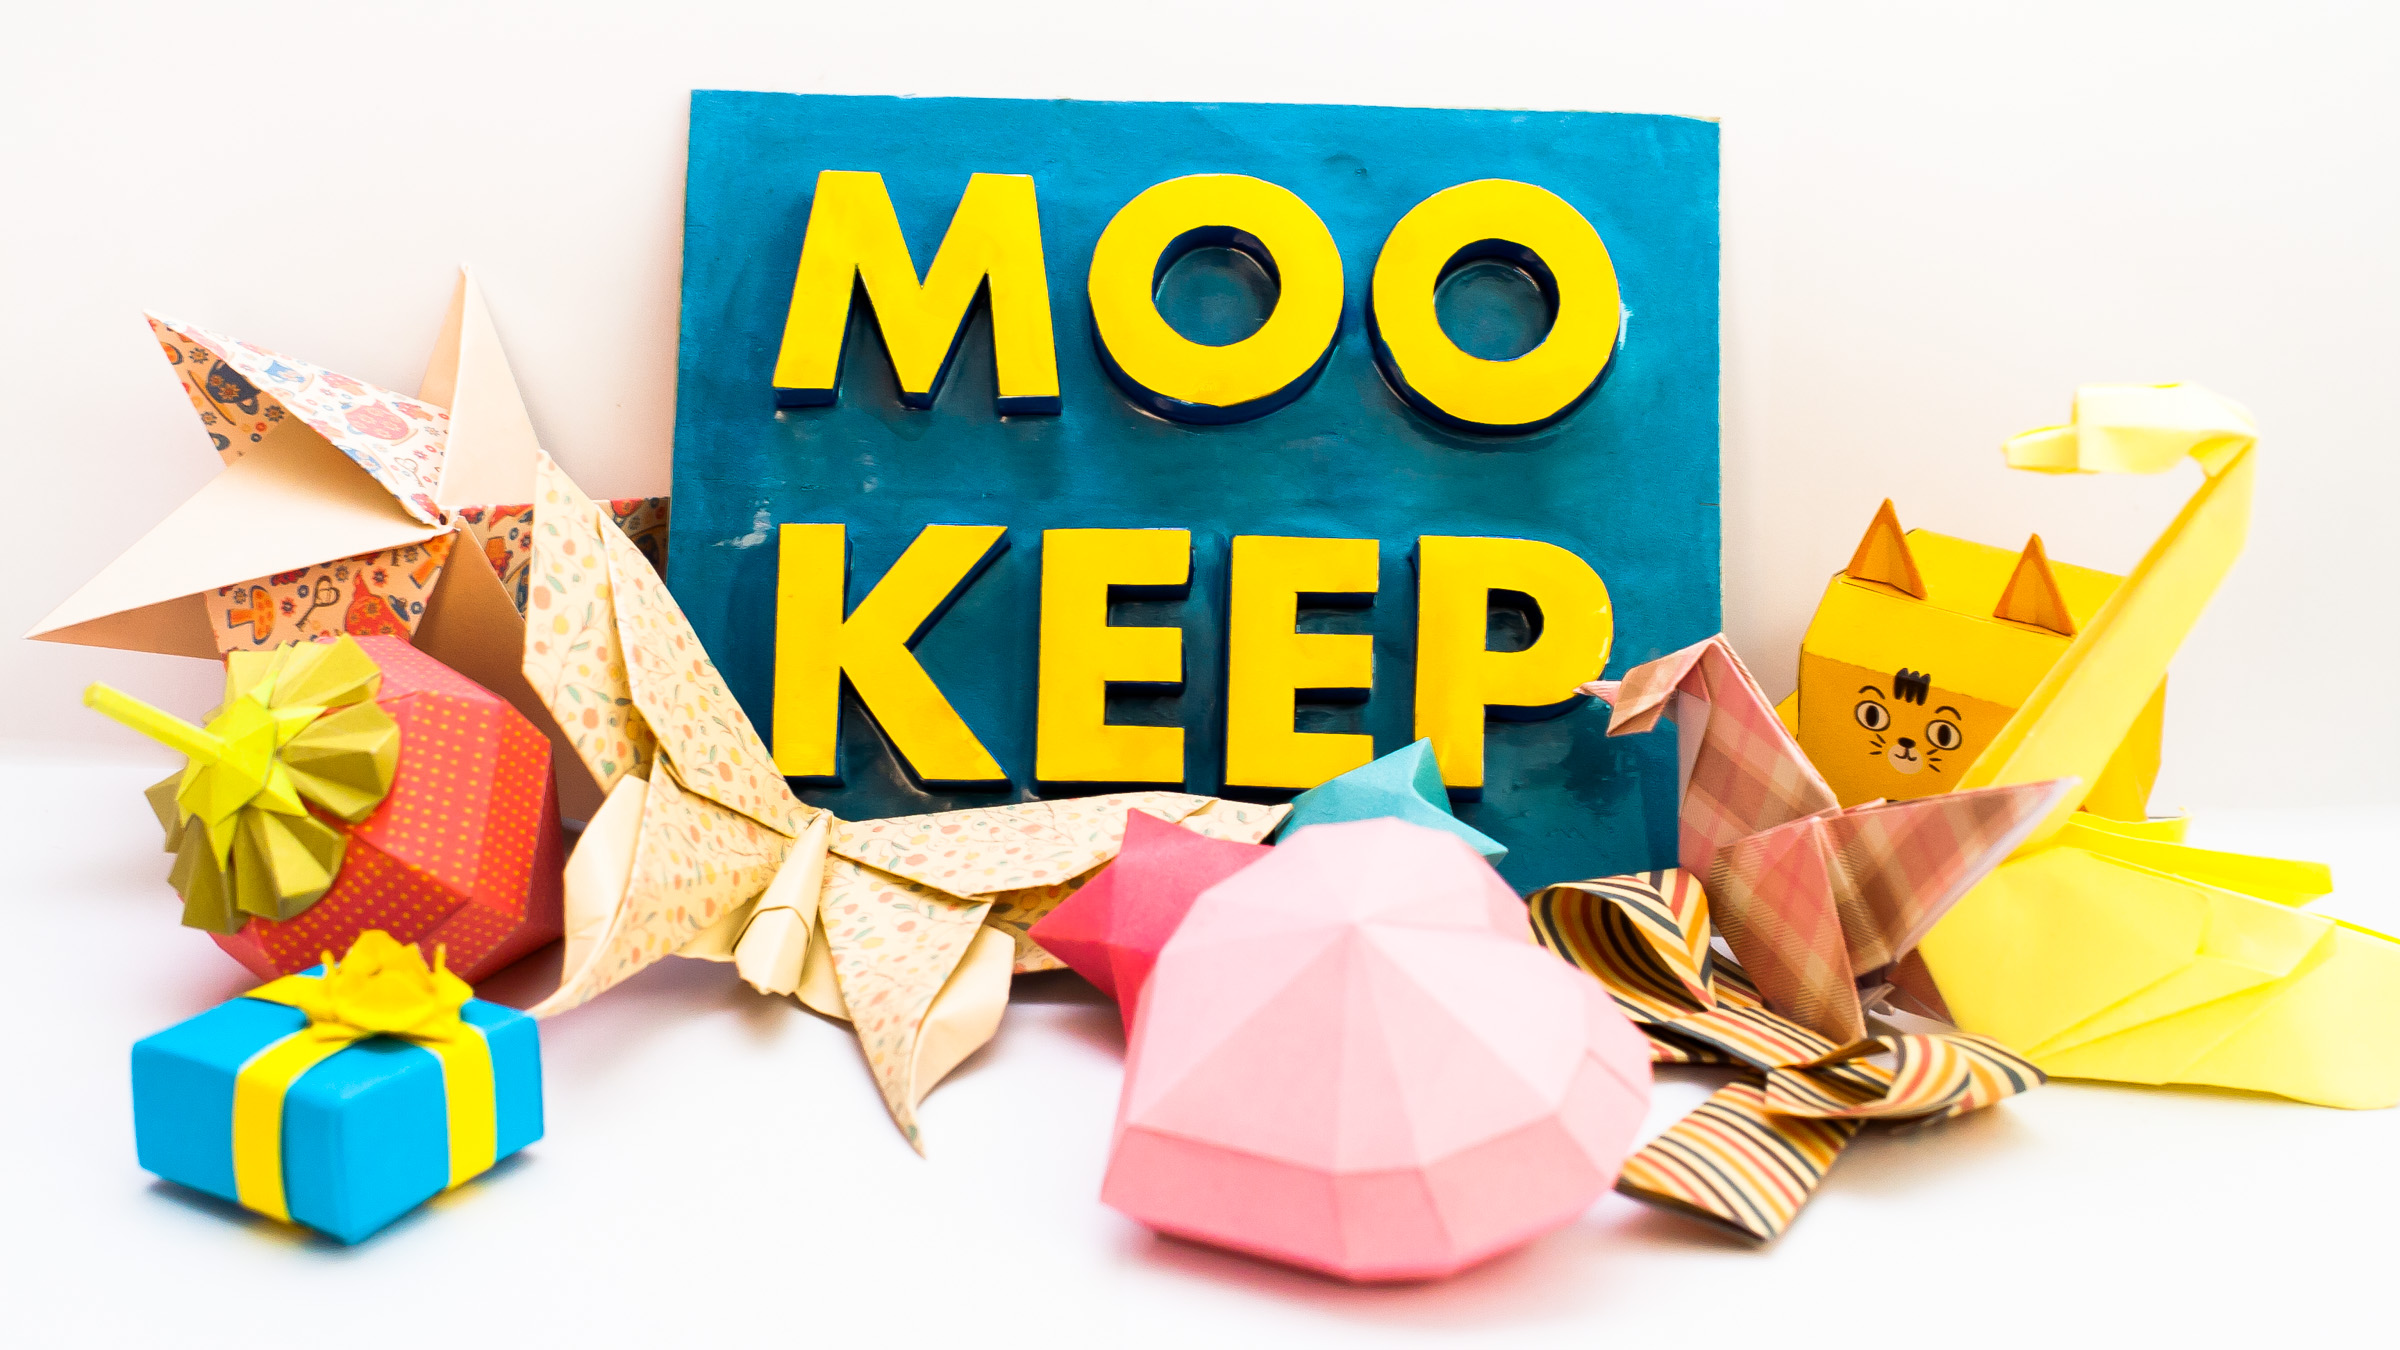 Mookeep.com Papercraft & Origami - January 2014 04